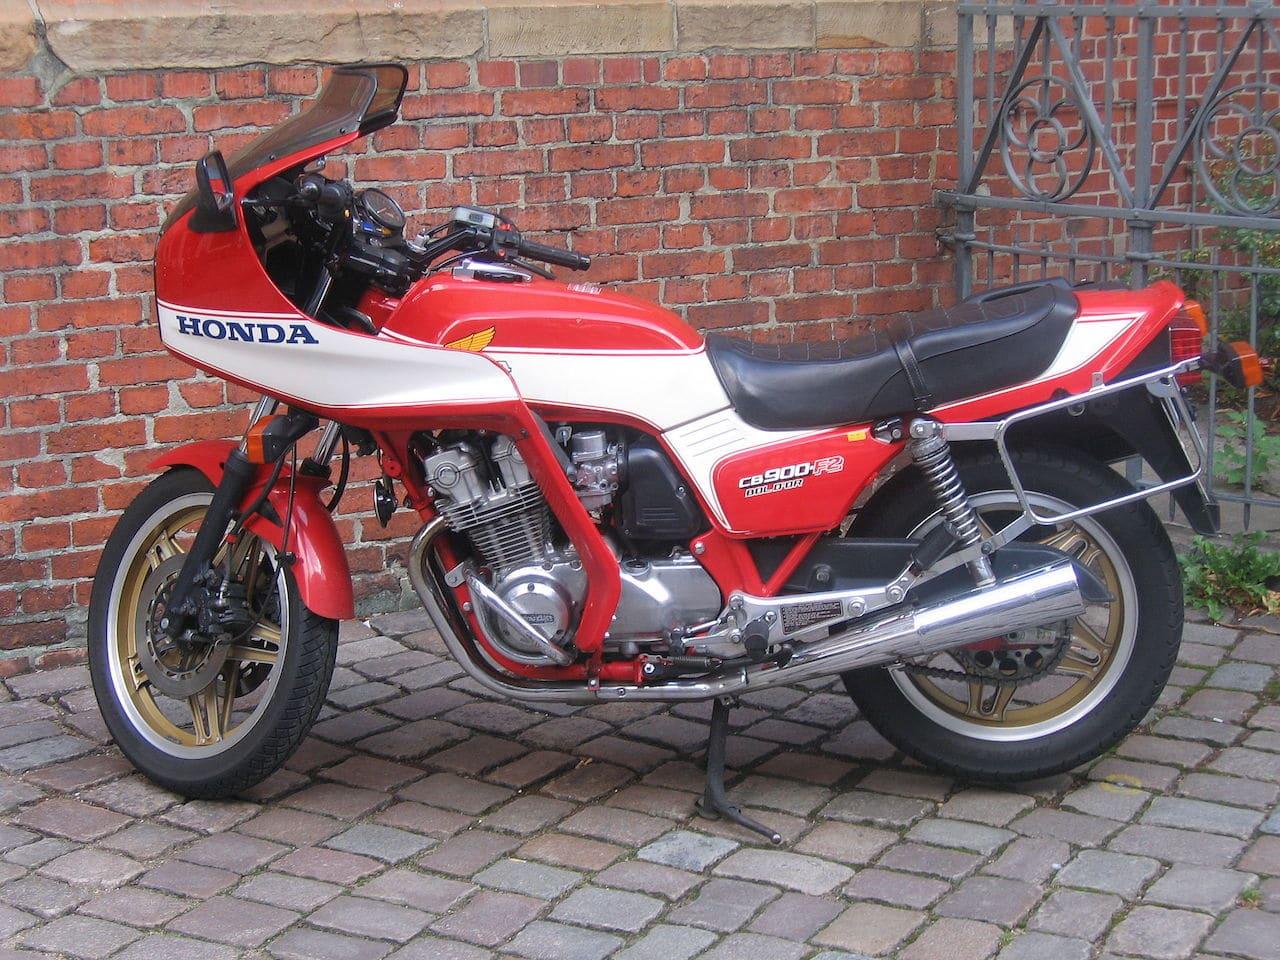 Red Honda CB900F2 Bol d'Or in bikini fairing